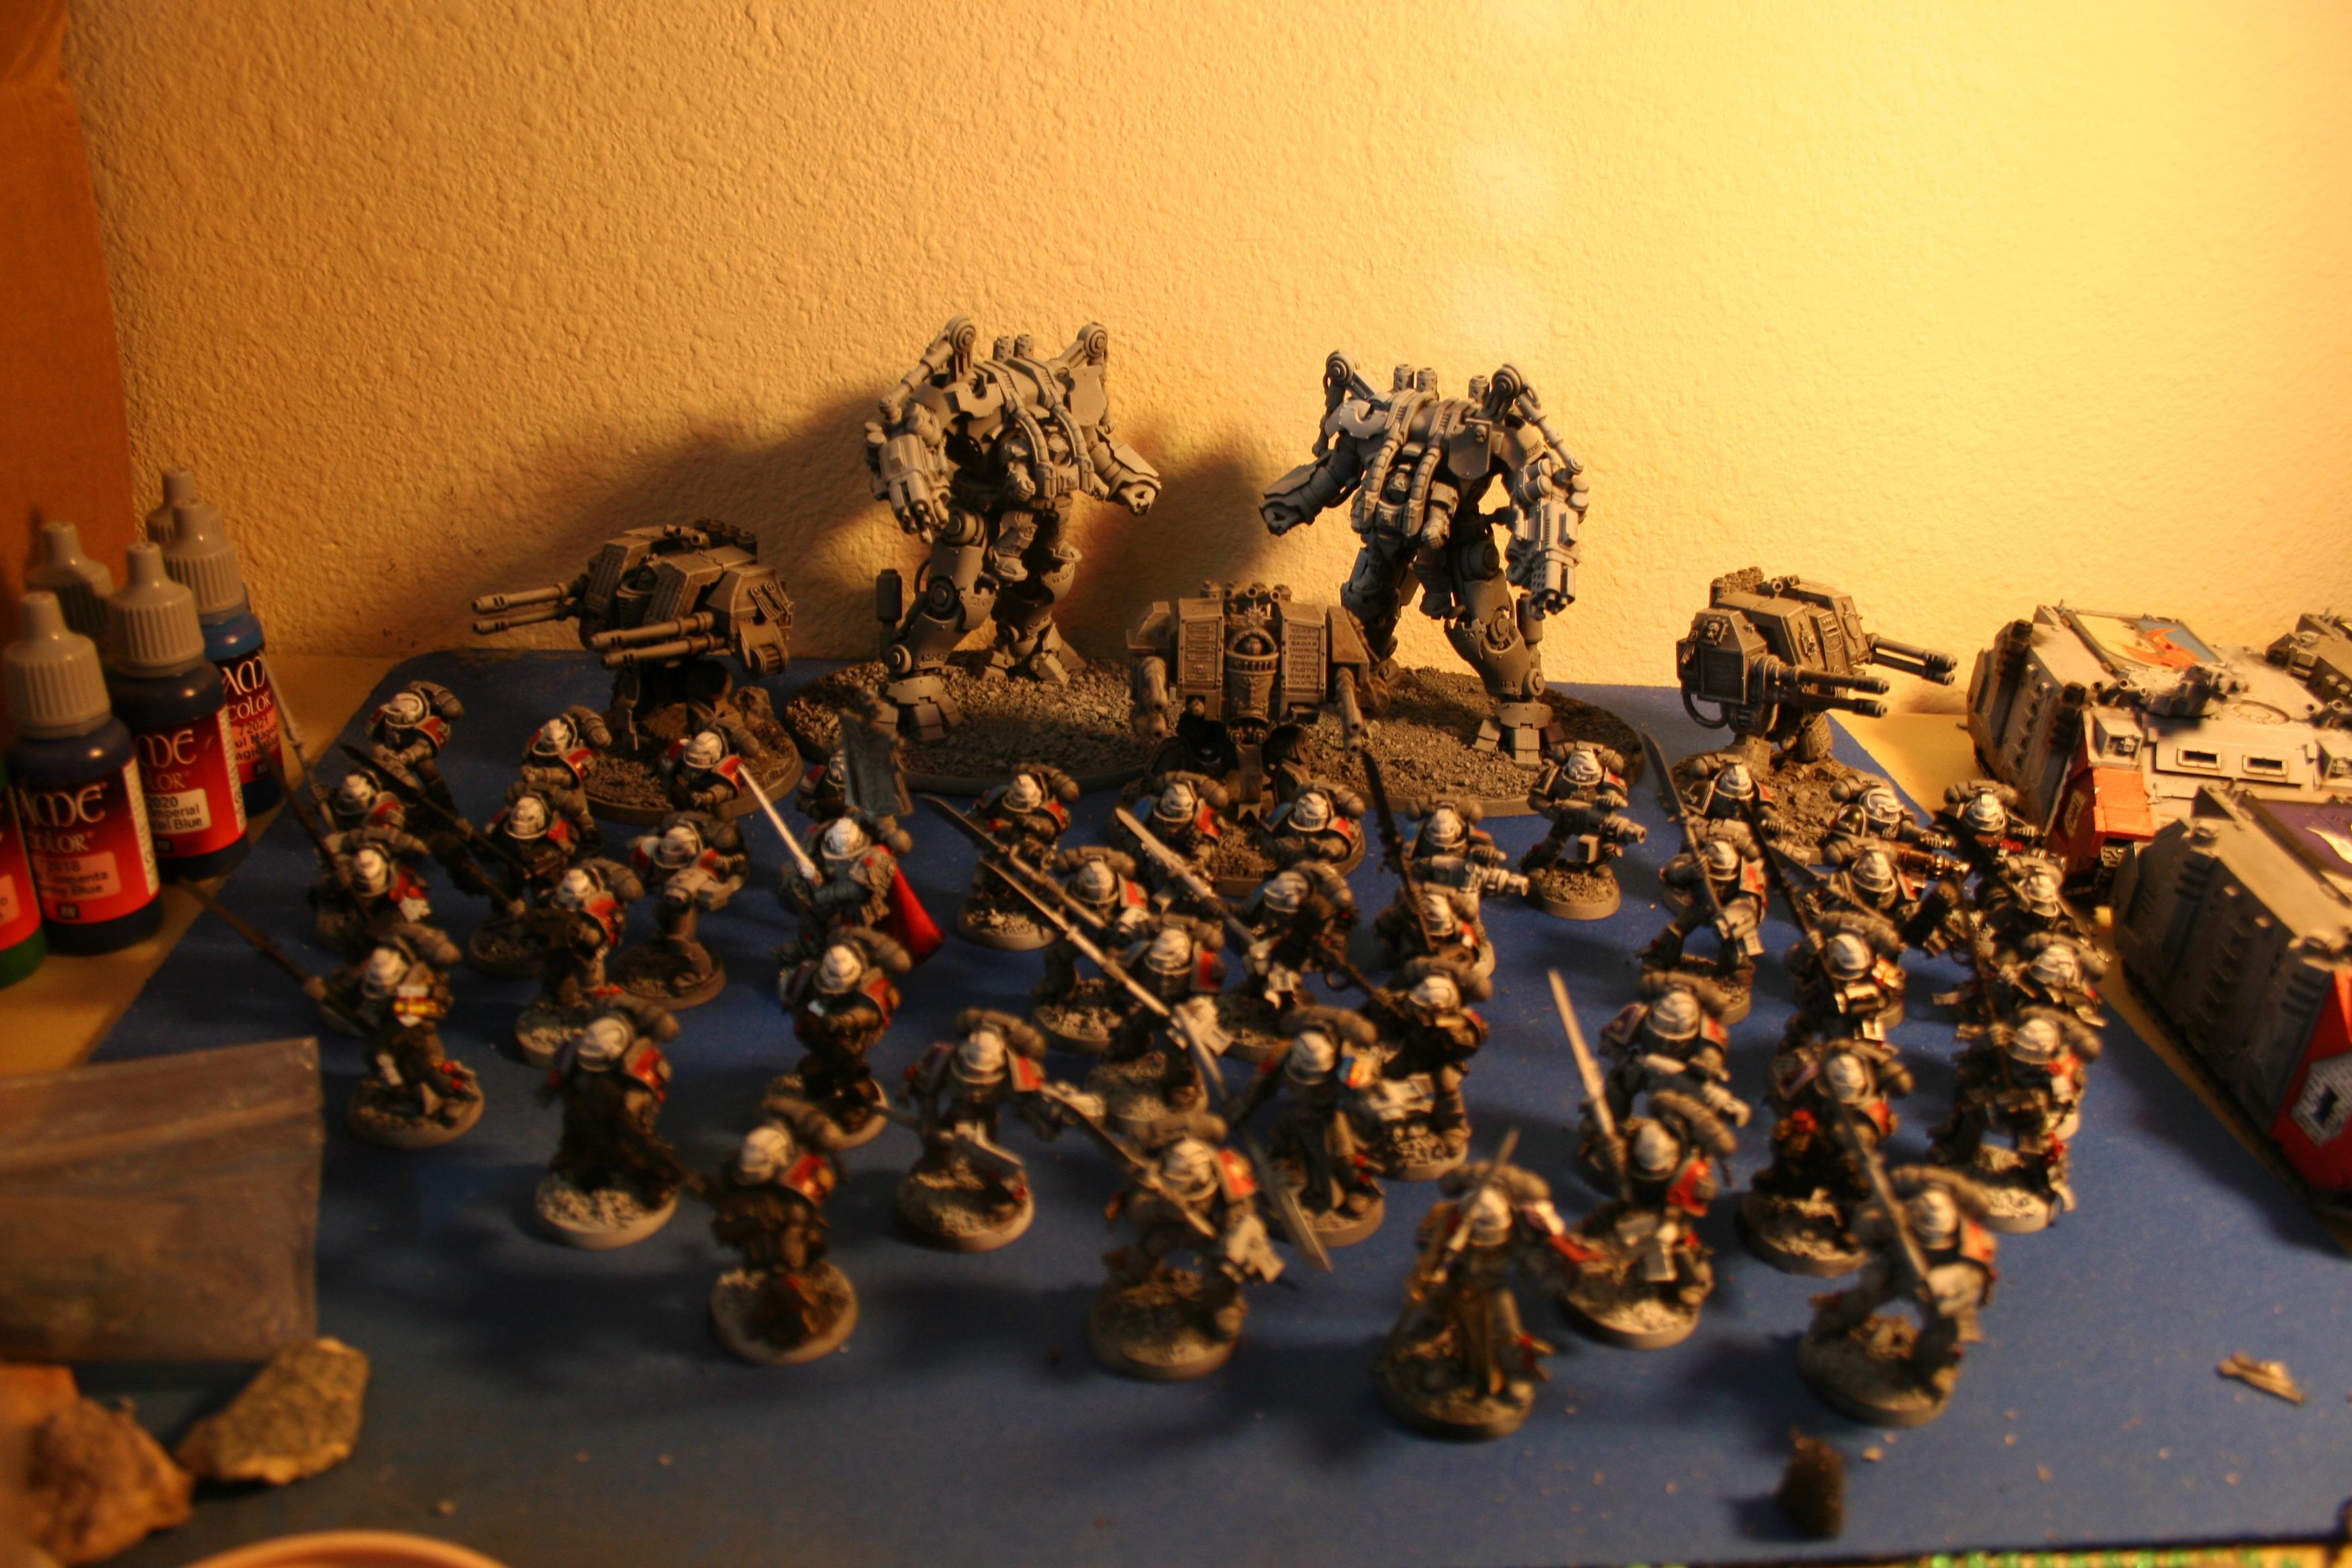 Castellan, Crowe, Dreadknight, Drybrush, Grey, Grey Knights, Nemesis, Purifier